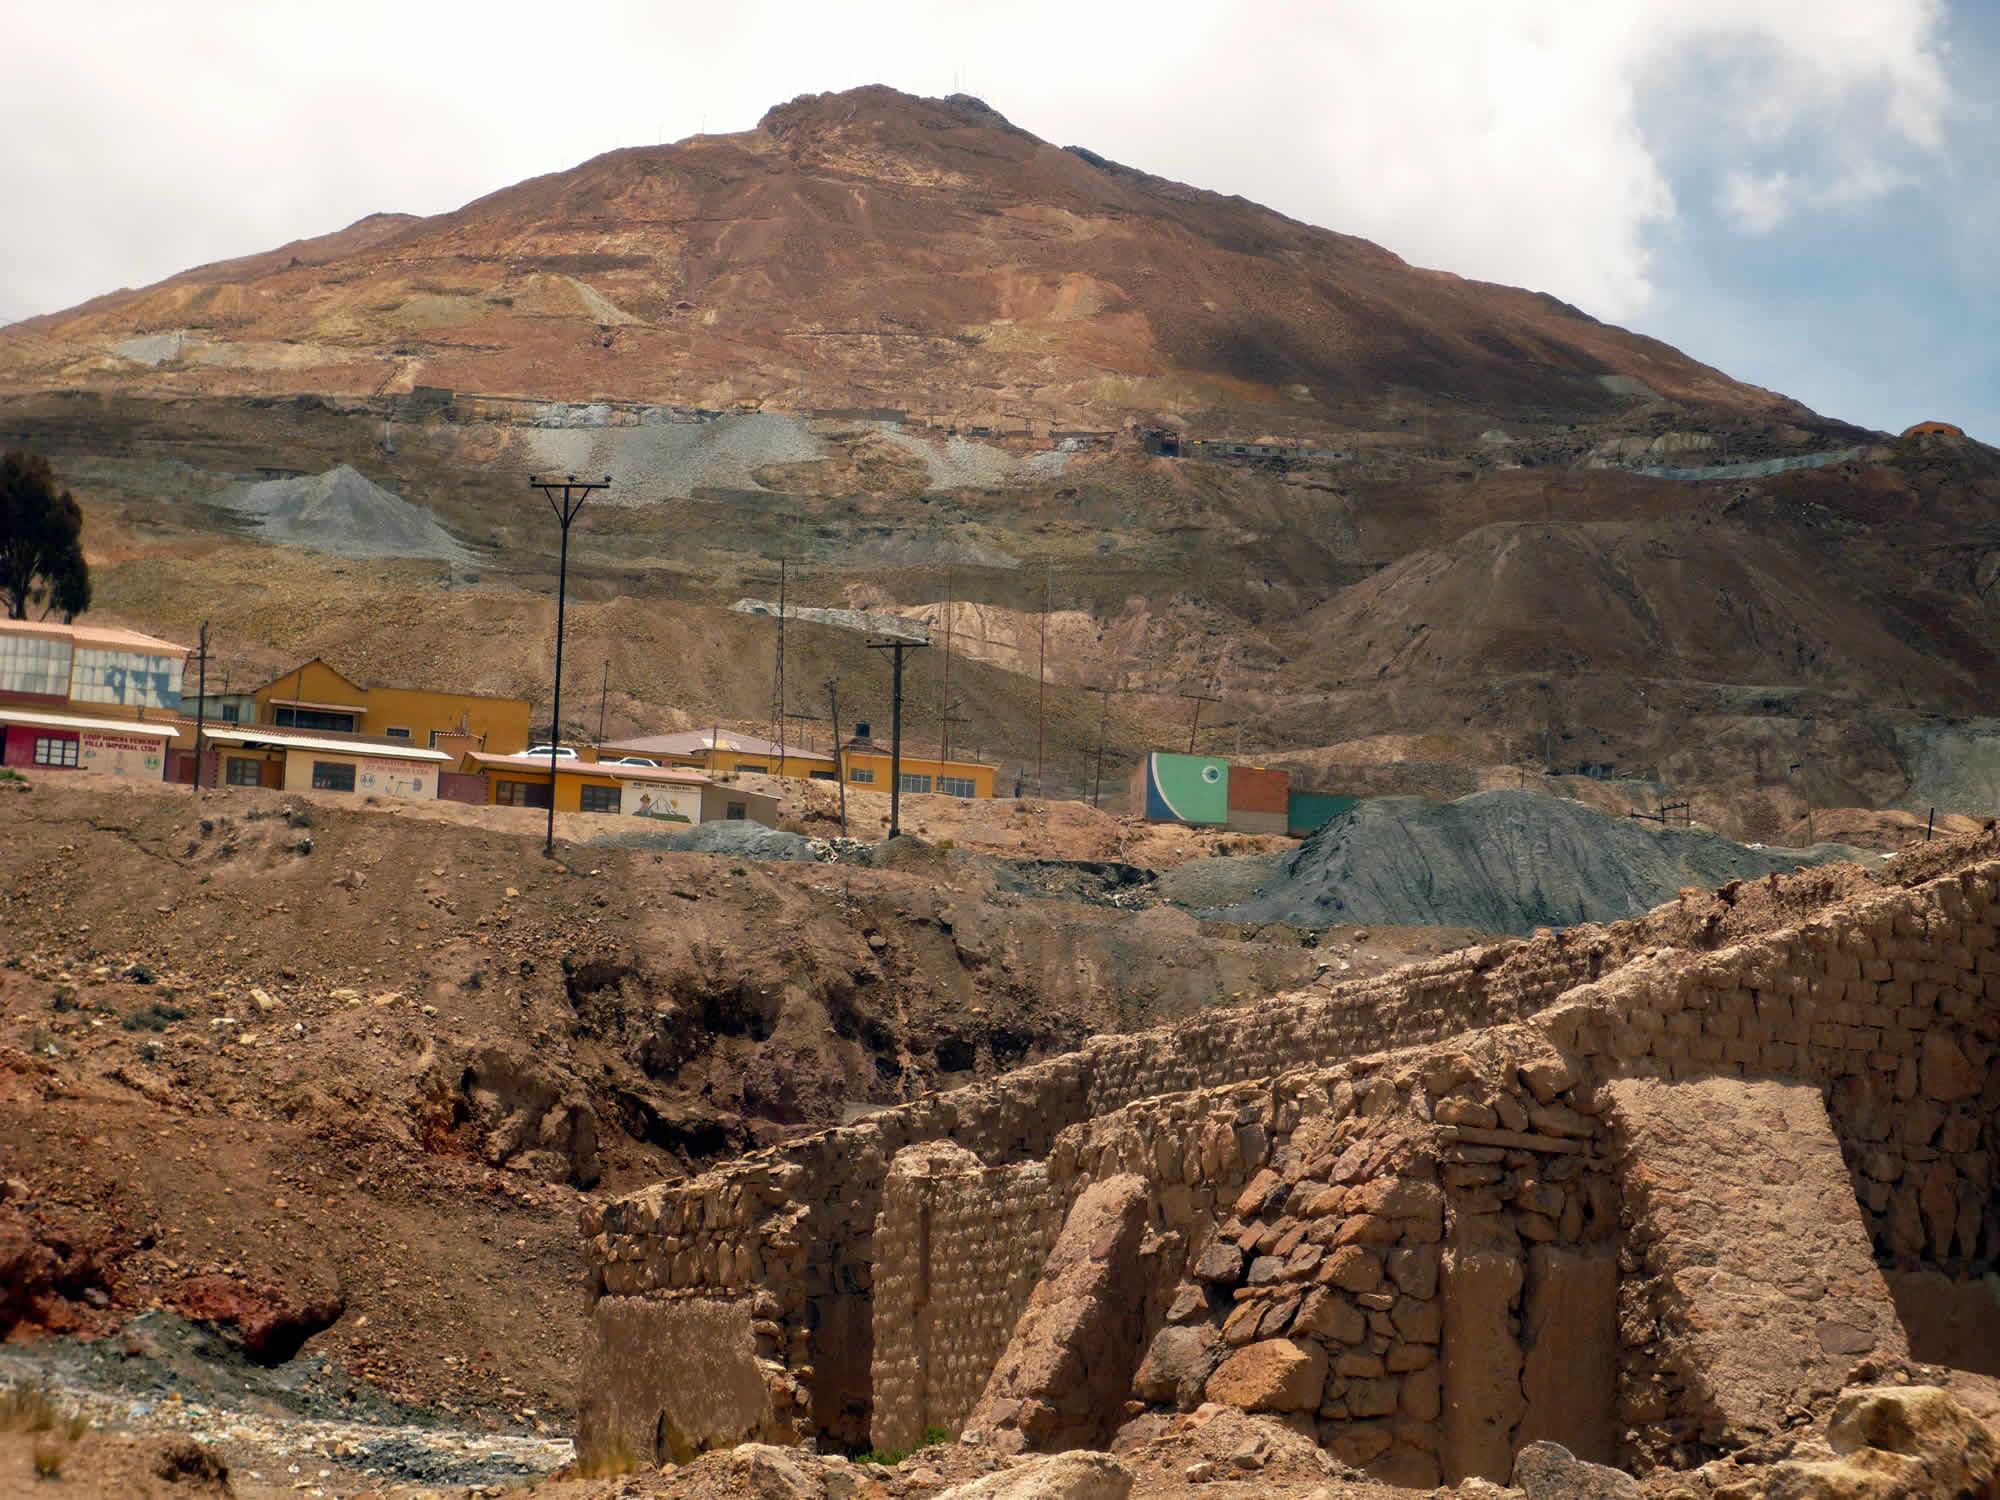 Silver Mines of Potosí